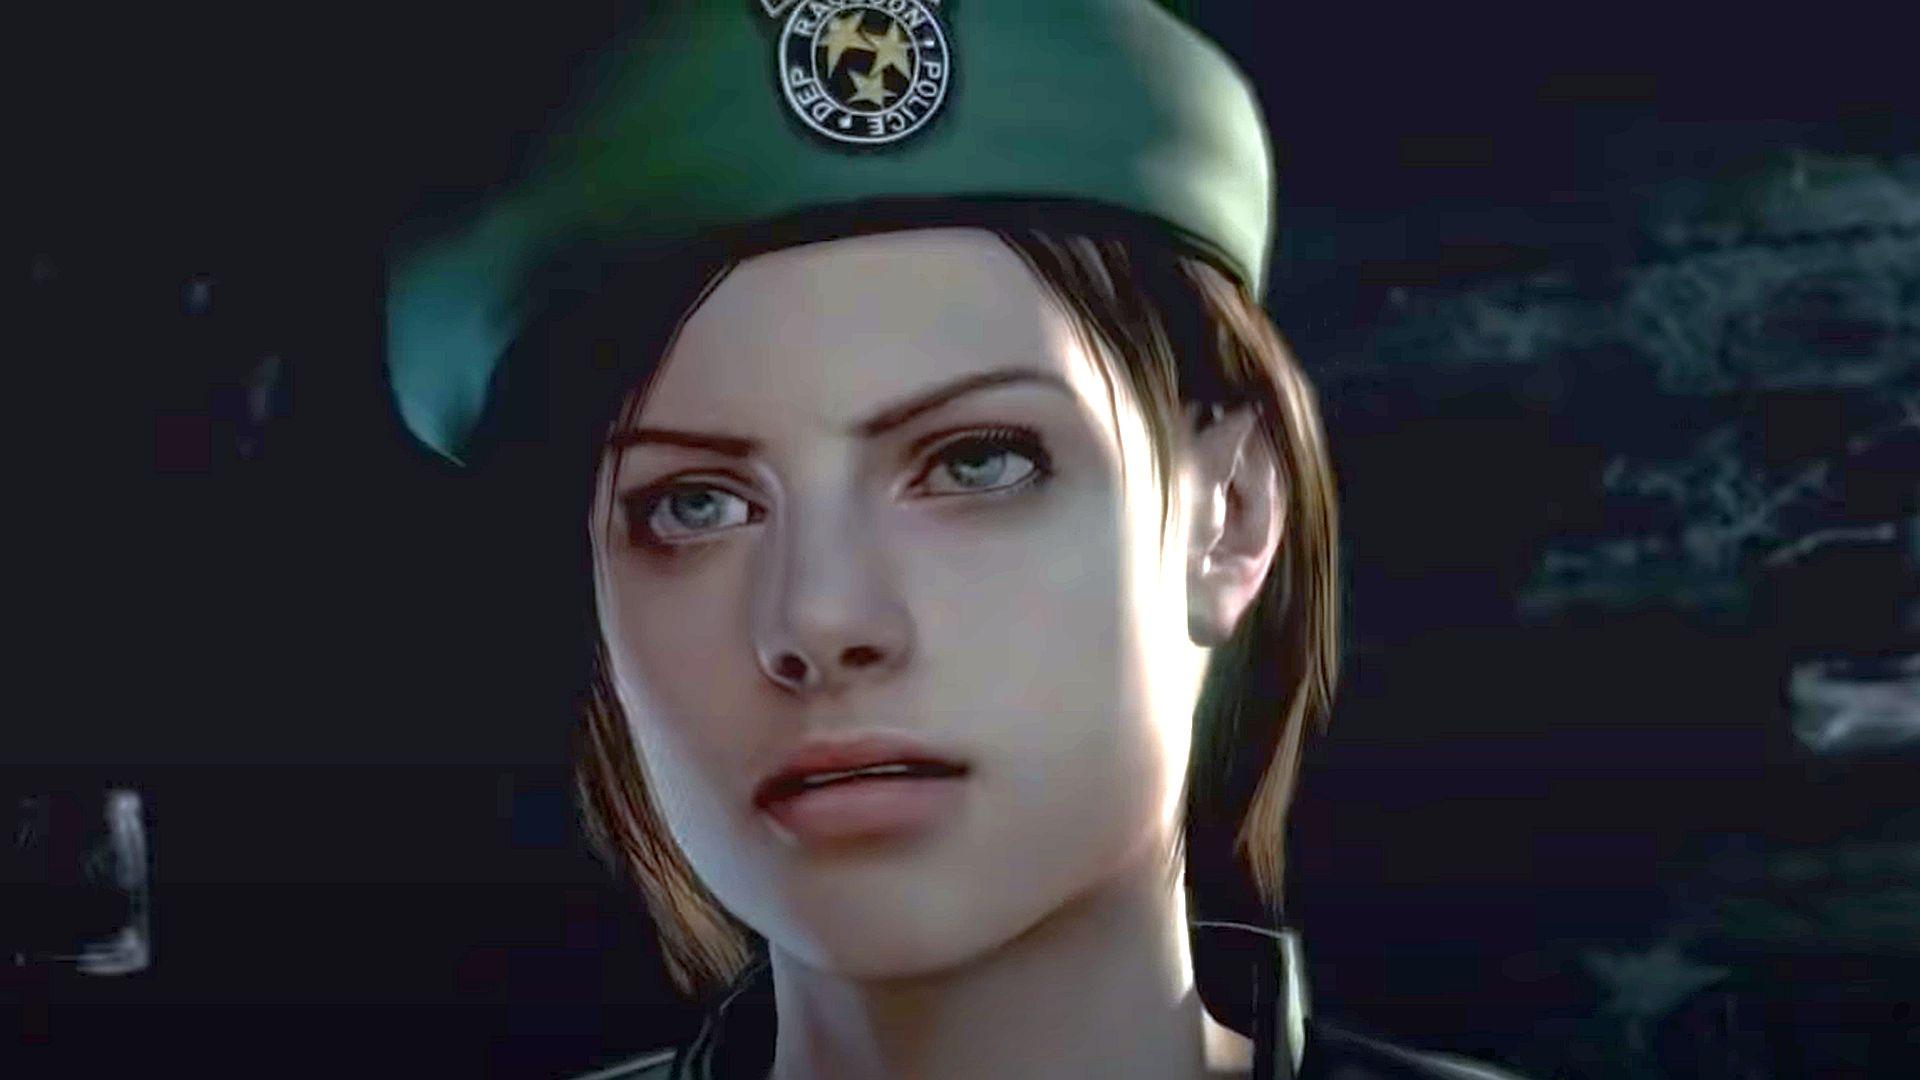 Rainbow Six Siege's Zofia gets an elite Resident Evil Jill Valentine skin